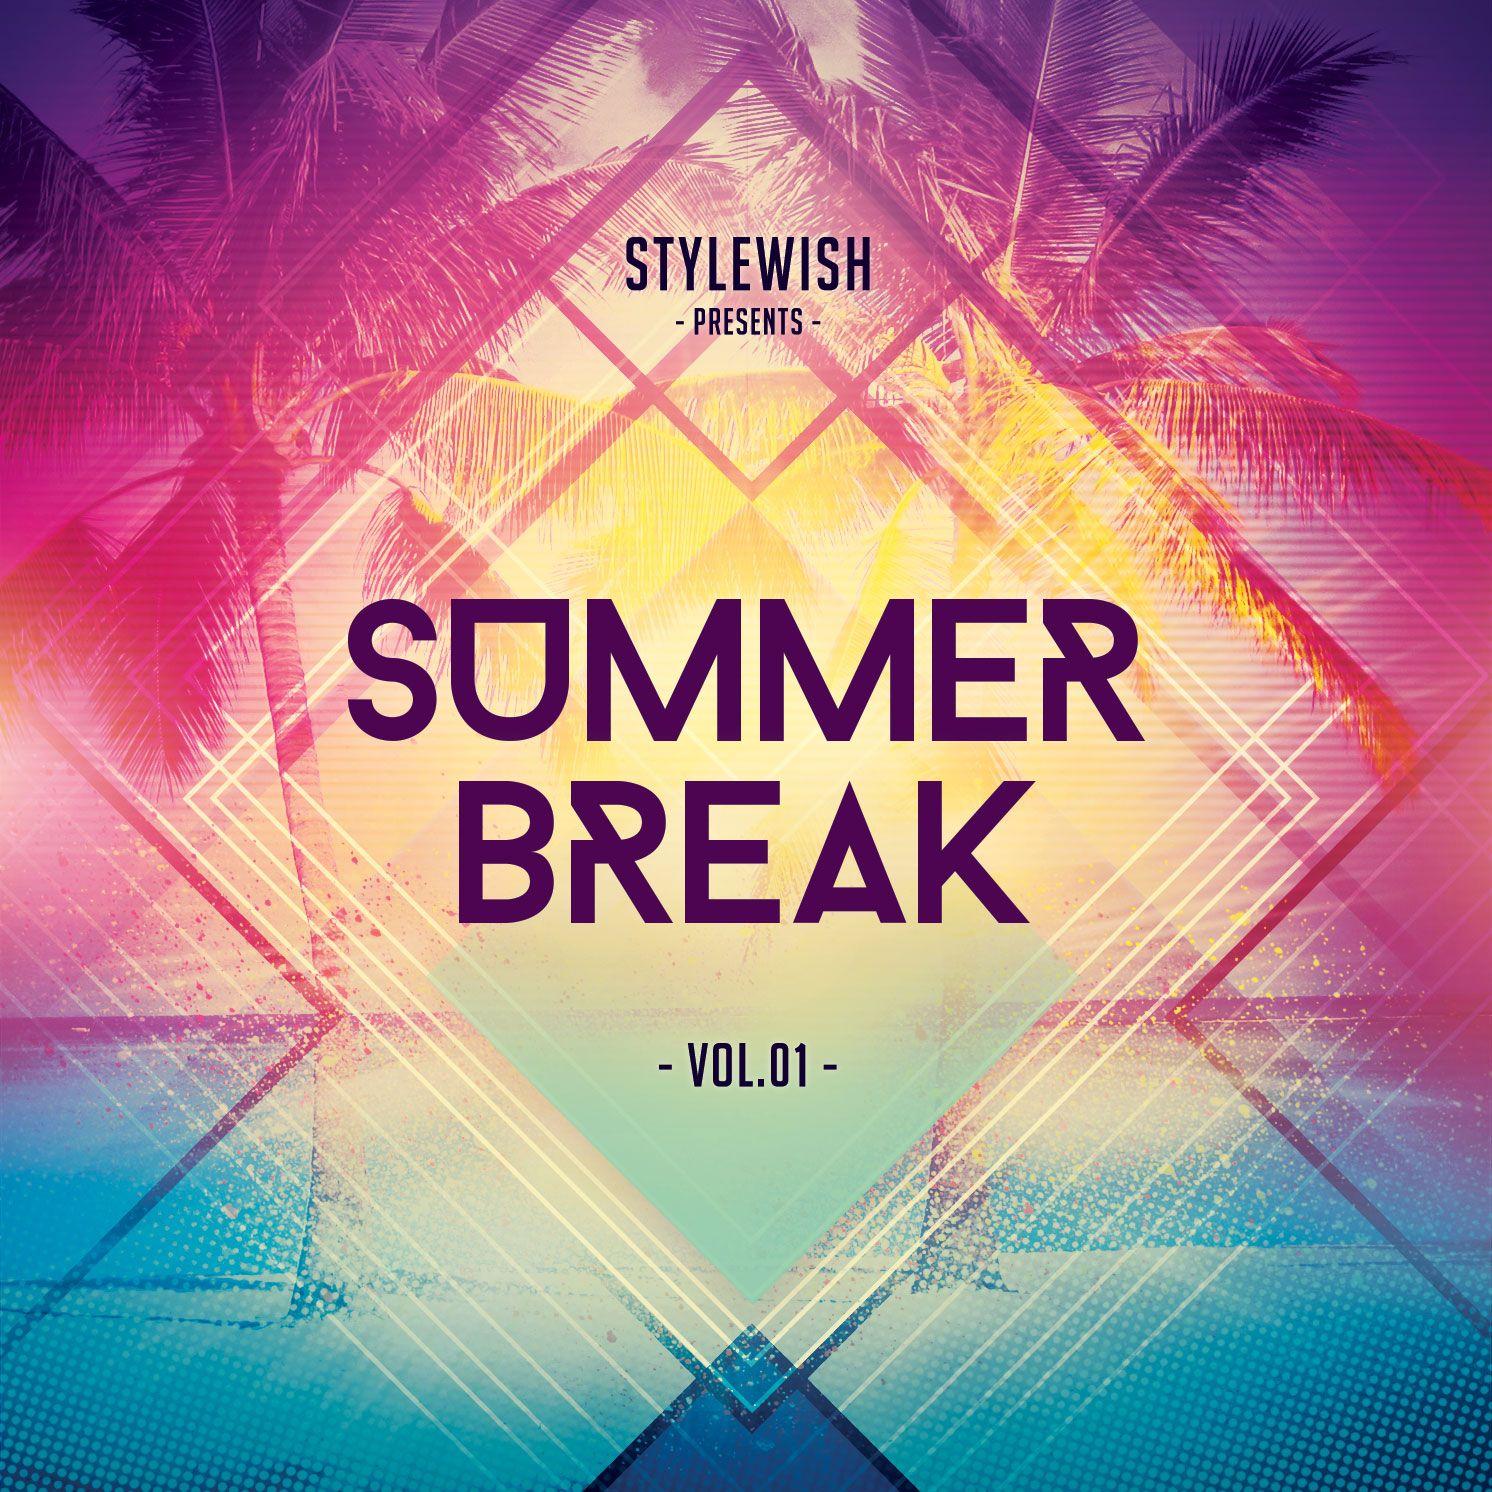 cd inlay template - summer break cd cover artwork pinterest cd cover cd